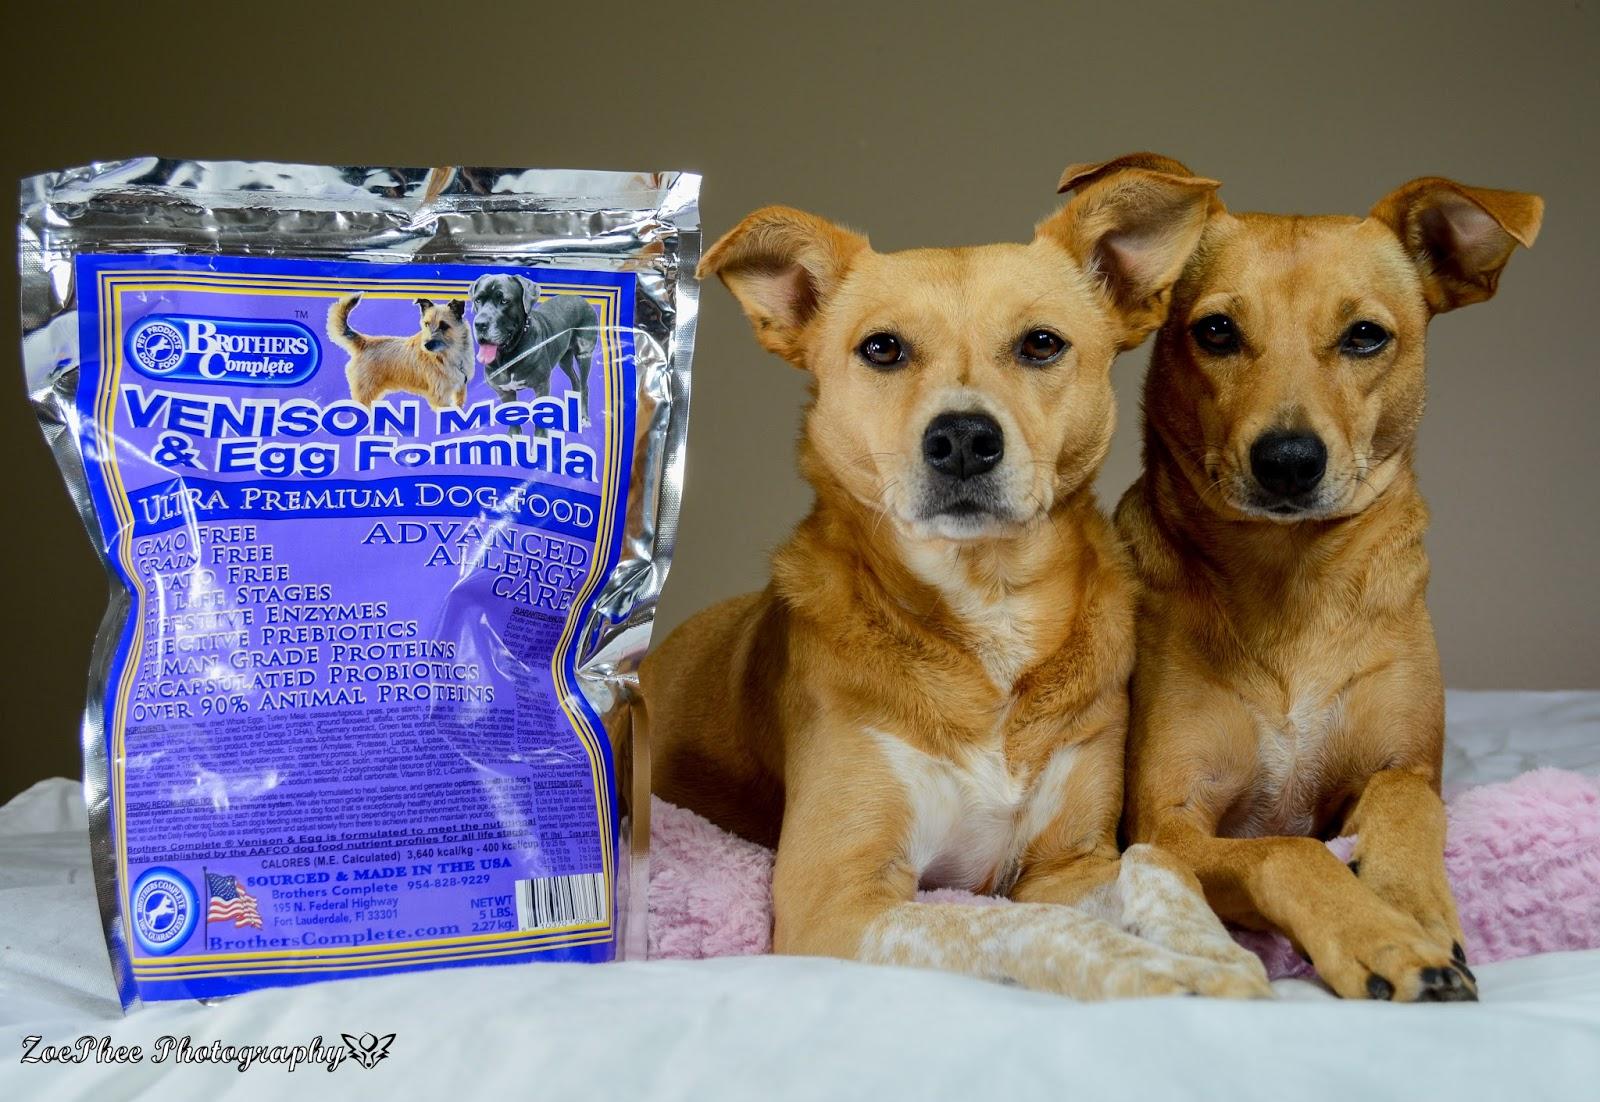 premuim dog food American natural premium navigation dog food original recipe lamb meal & rice recipe sensitive care endurance plus exhibitor's choice basic formula.